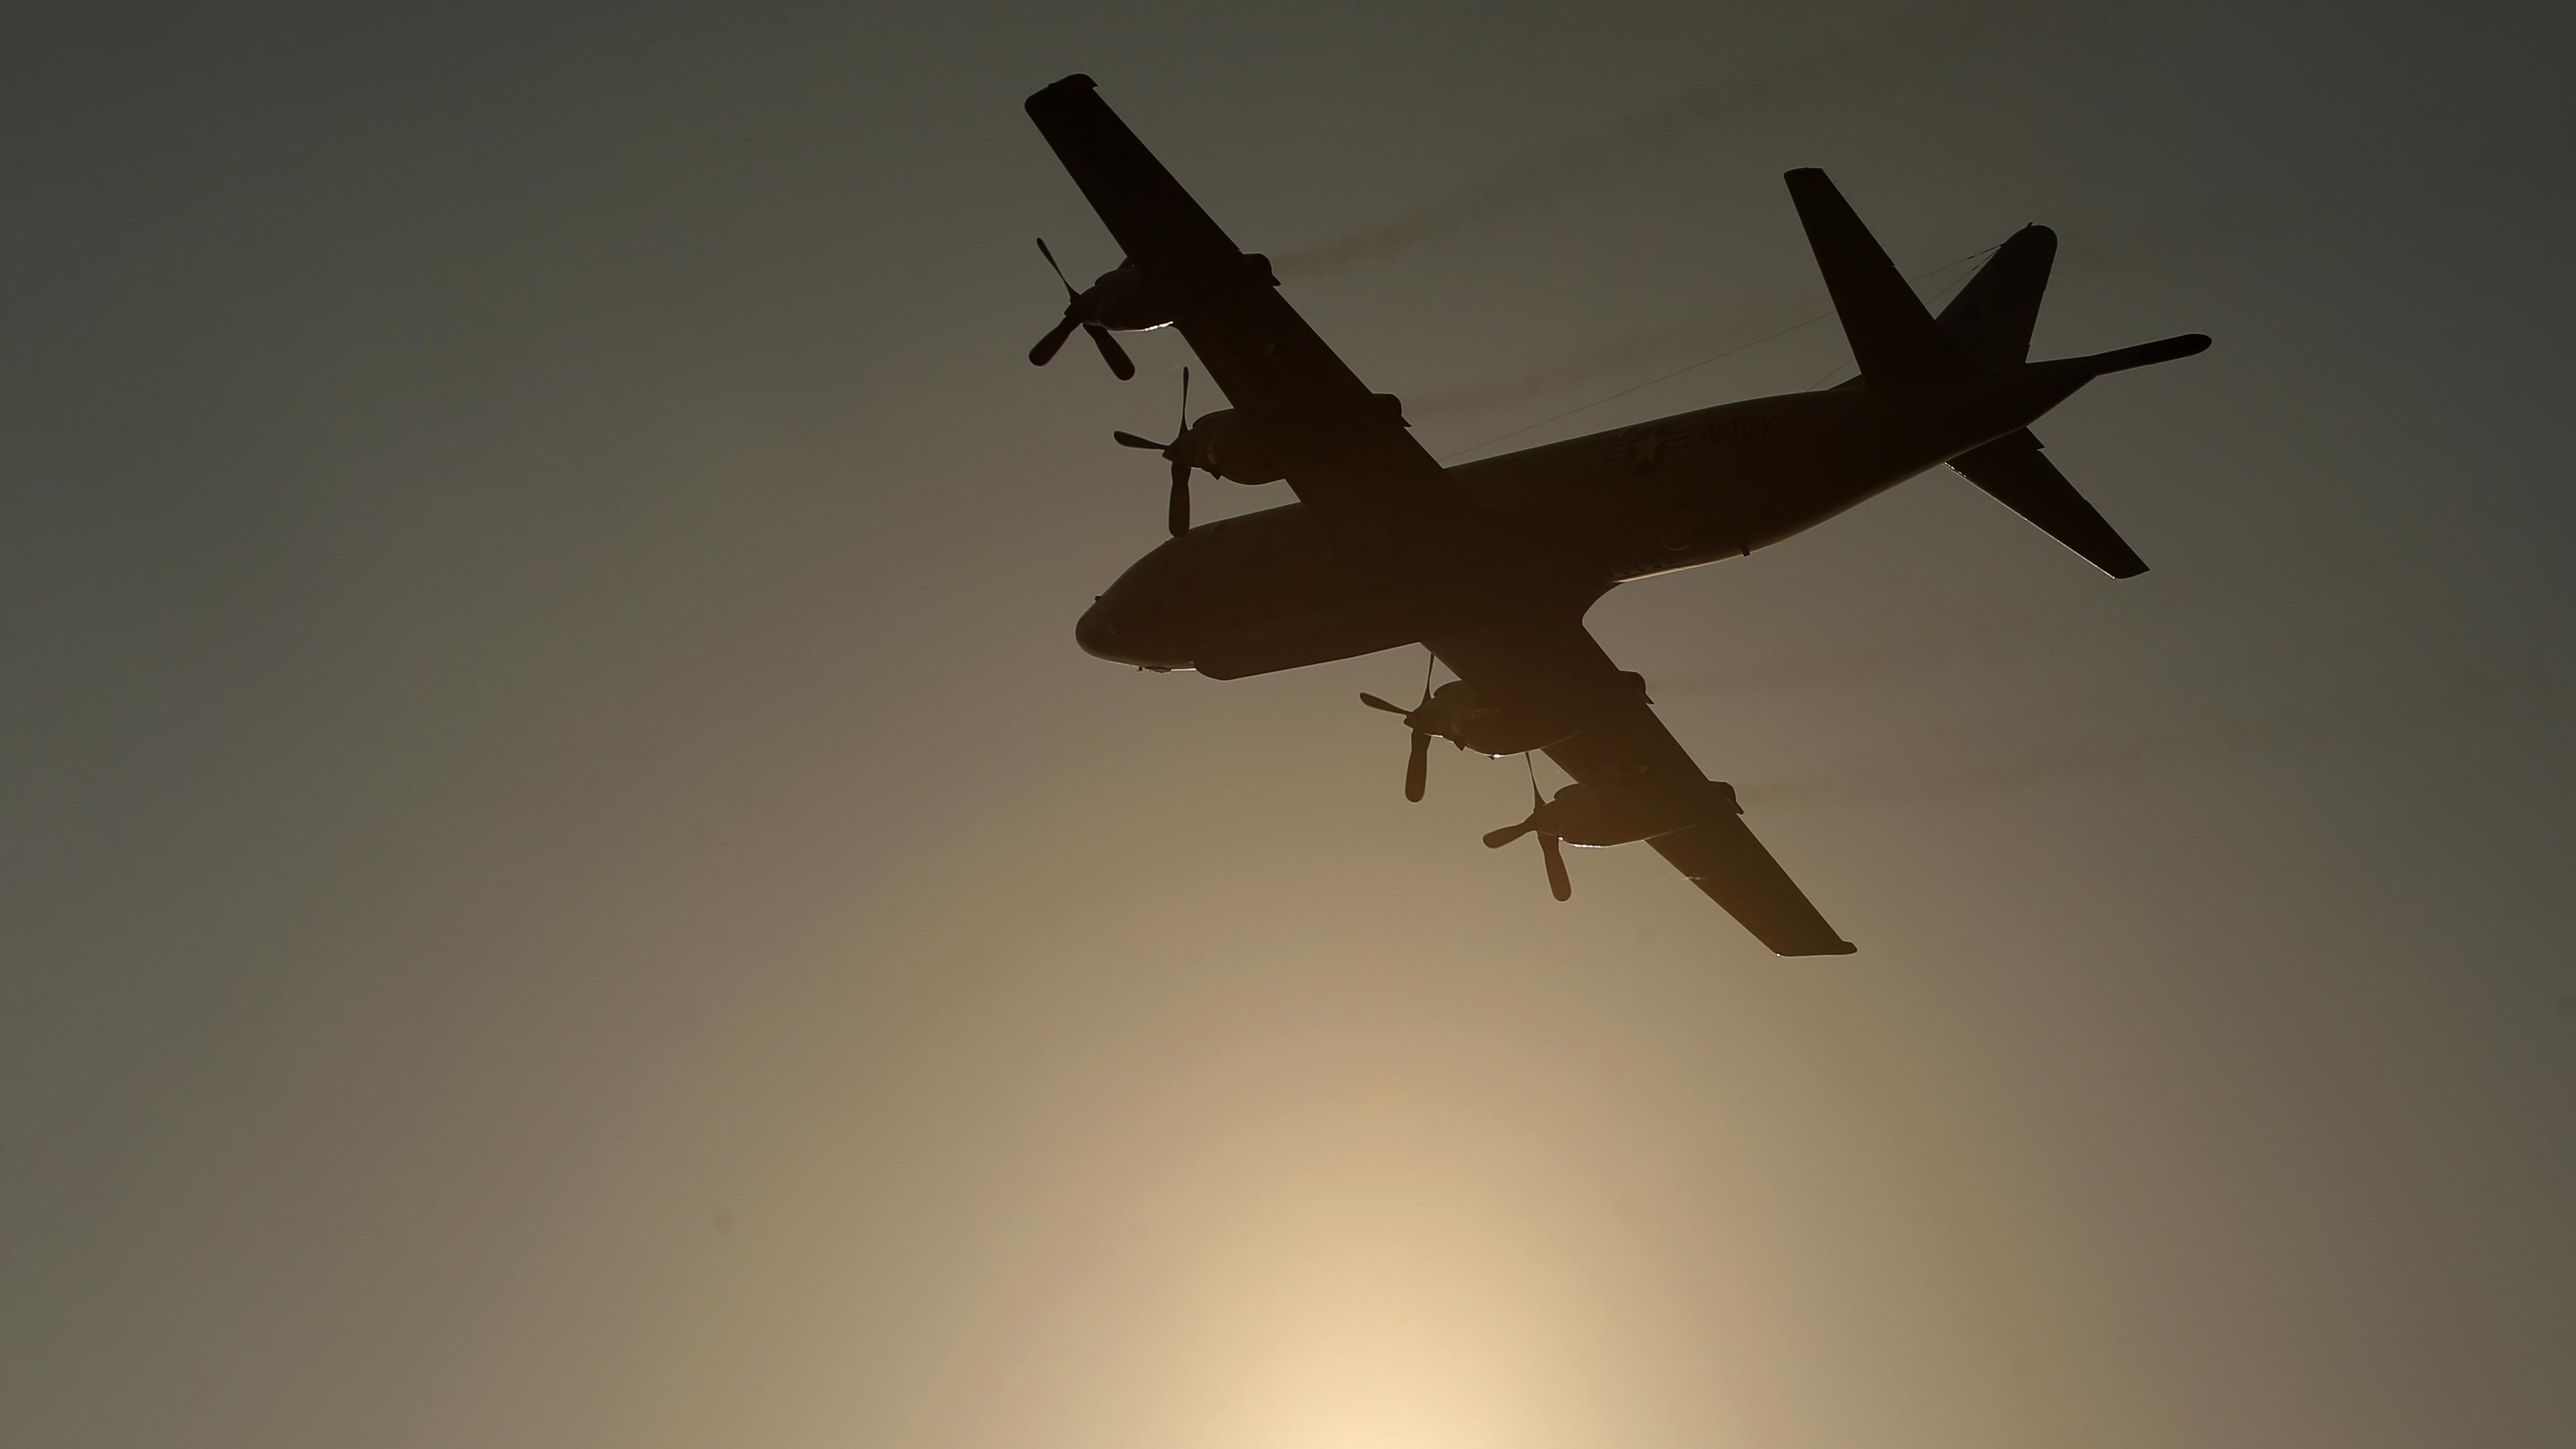 A US Navy aircraft flies over Incirlik airbase.